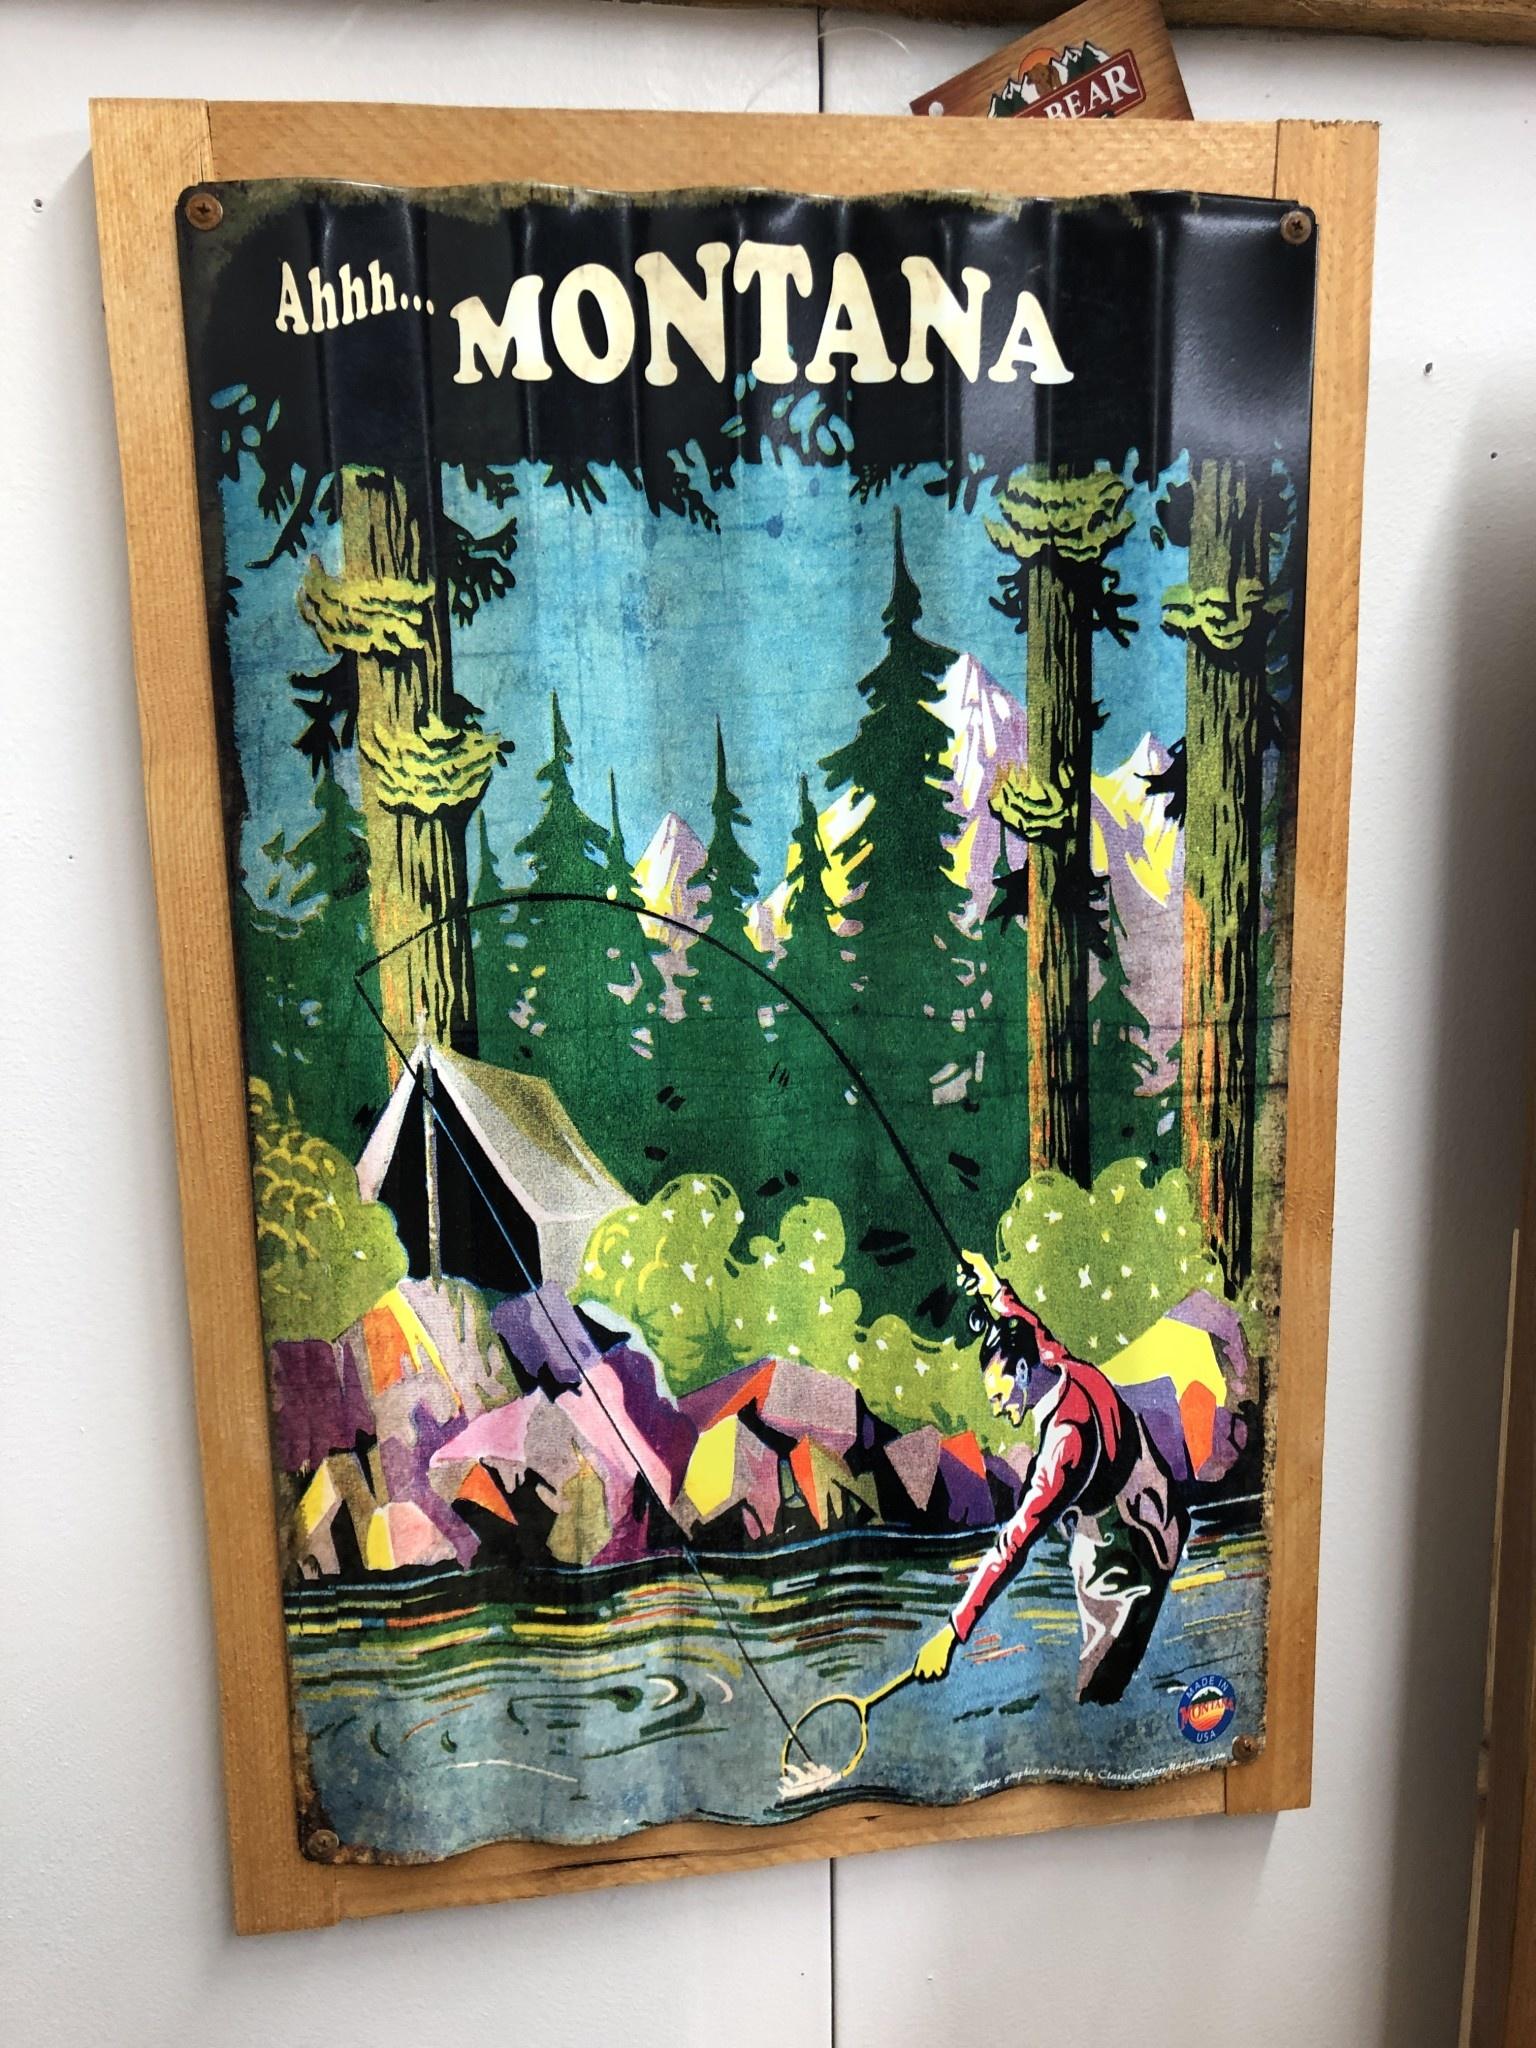 Classic Outdoor Magazines #1 Stream Angler Corrugated 17x26